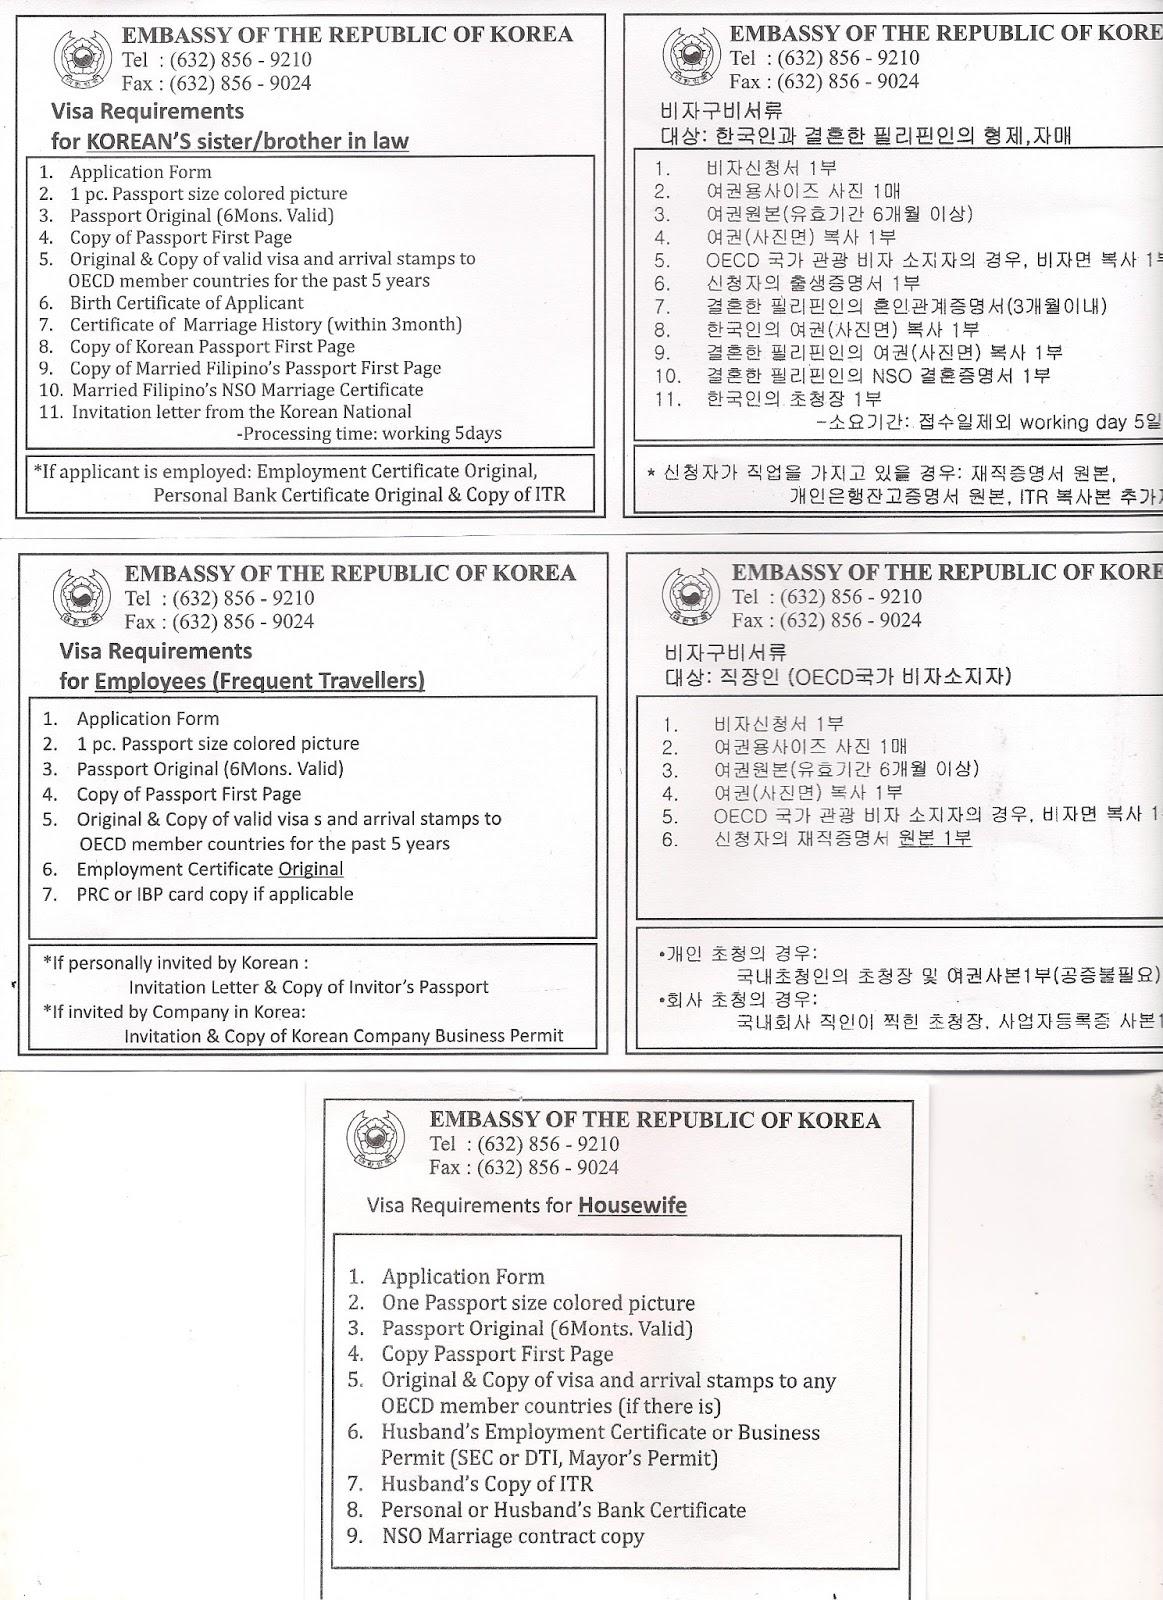 Sample Invitation Letter For Tourist Visa To South Korea Sample